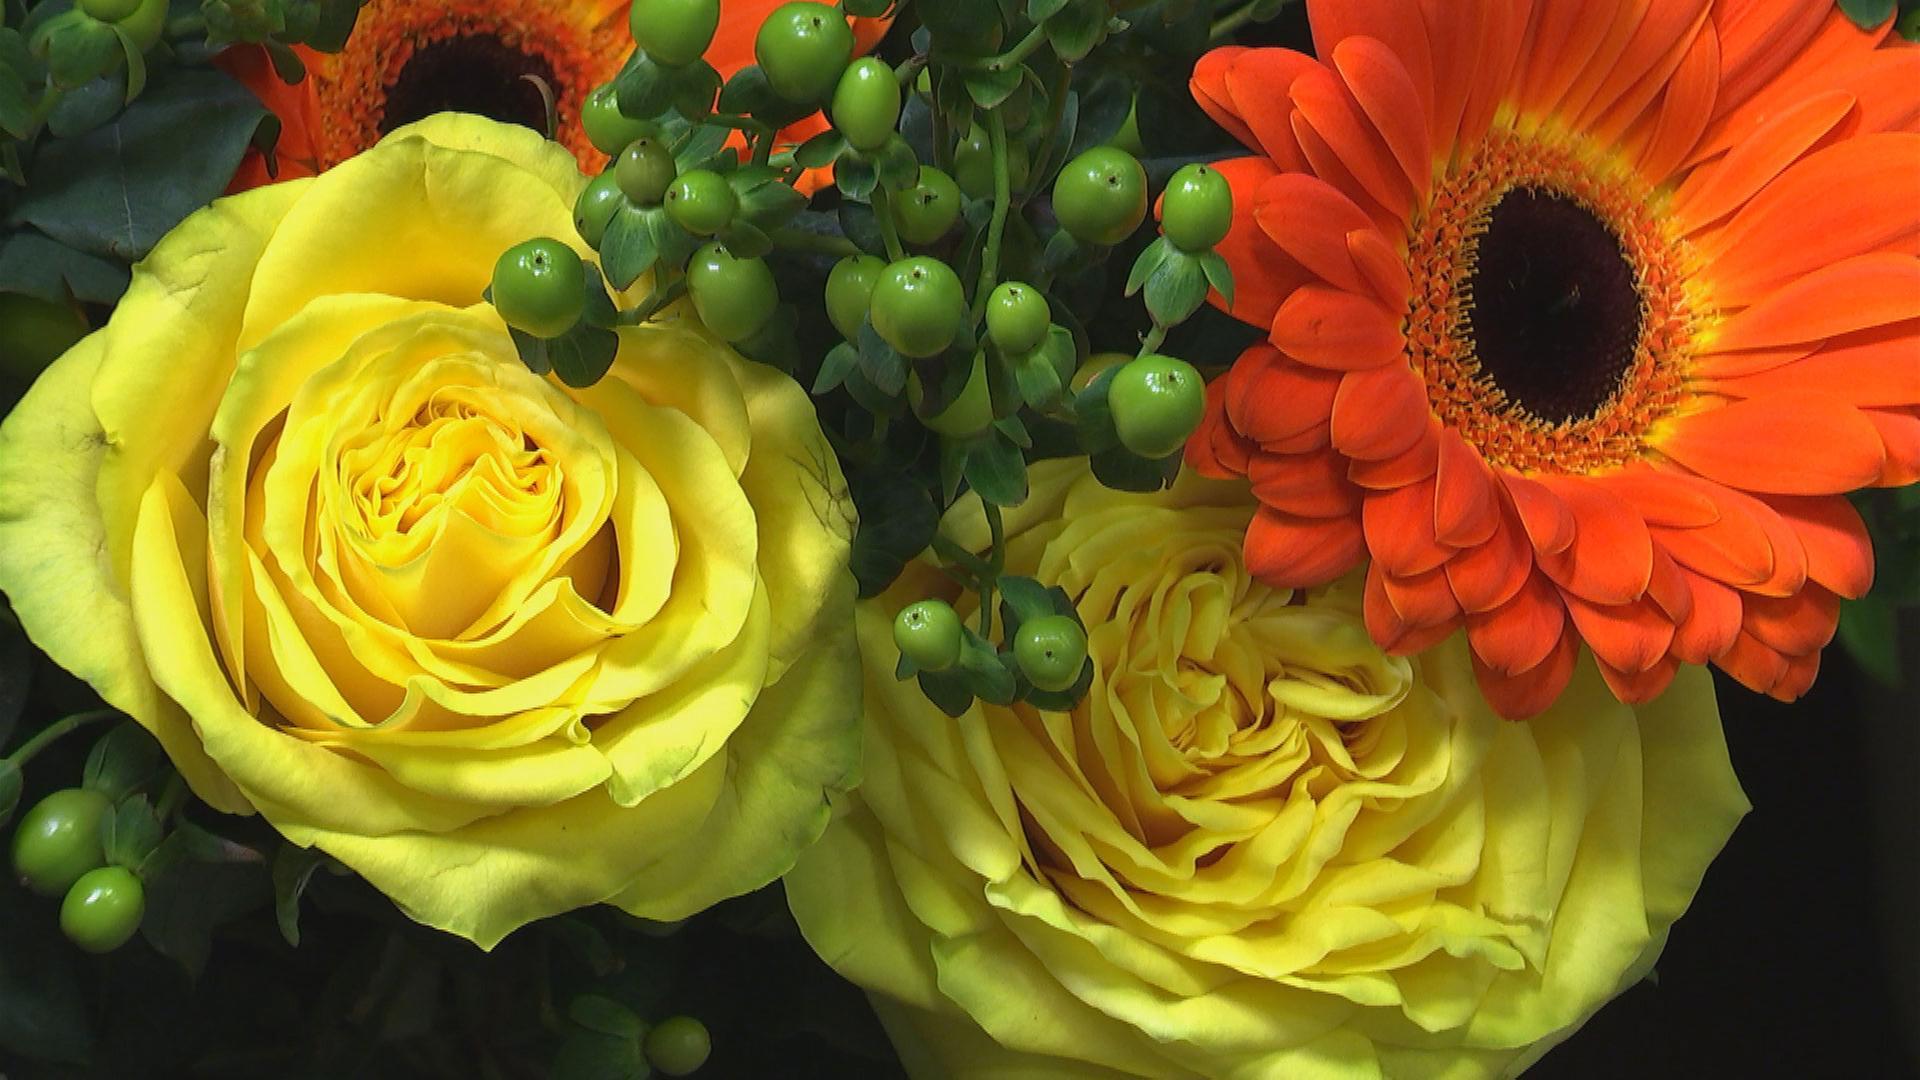 Blumenversand Im Test Zdfmediathek